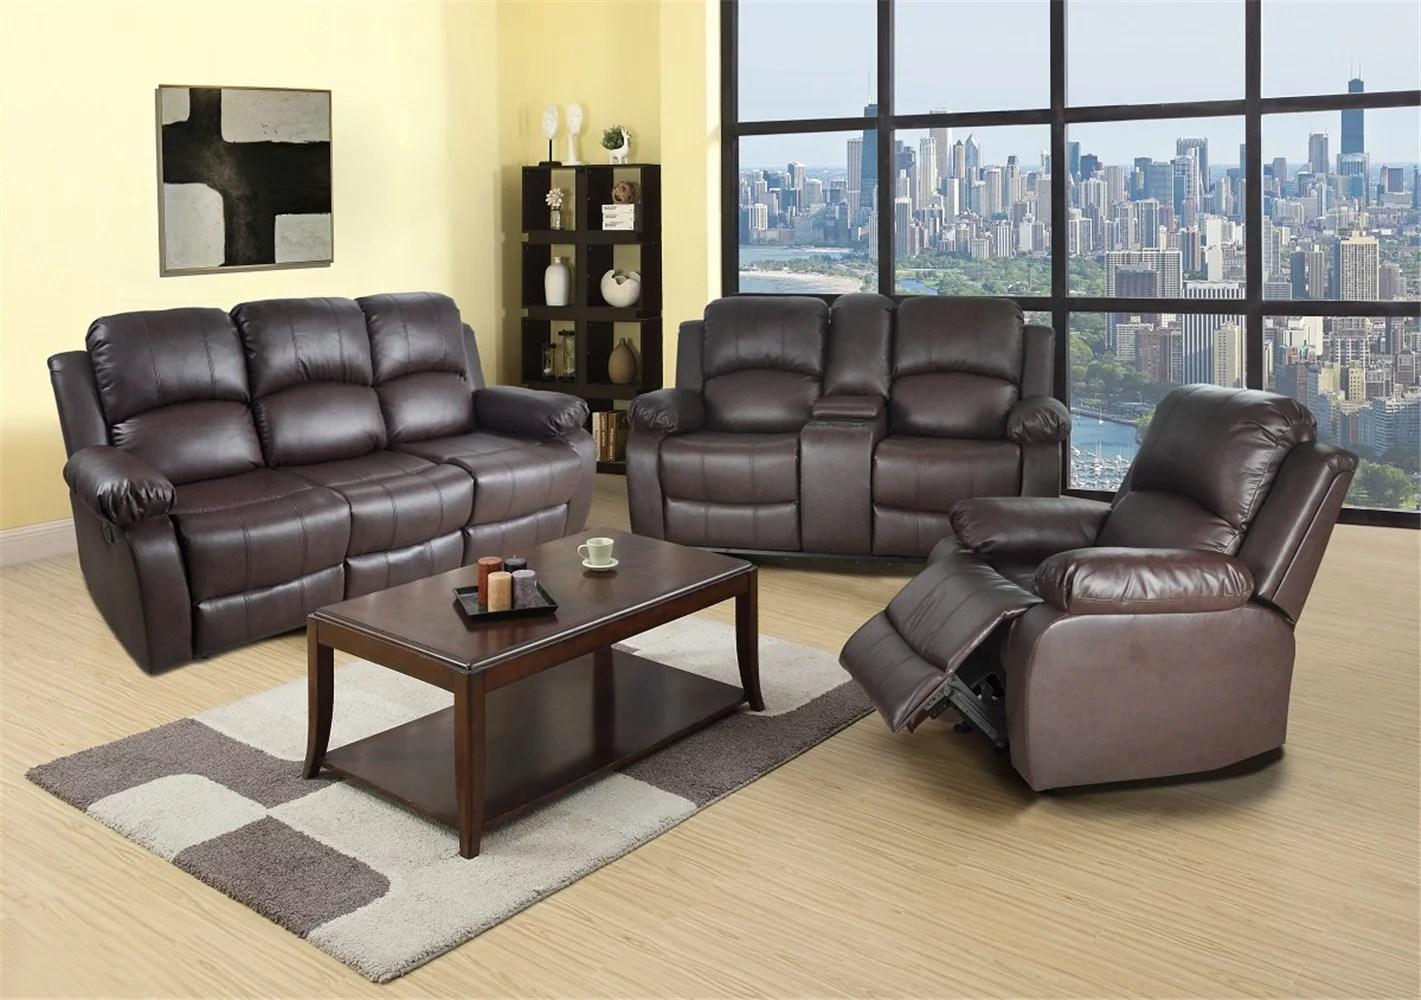 reclining sofa loveseat chair set living room set